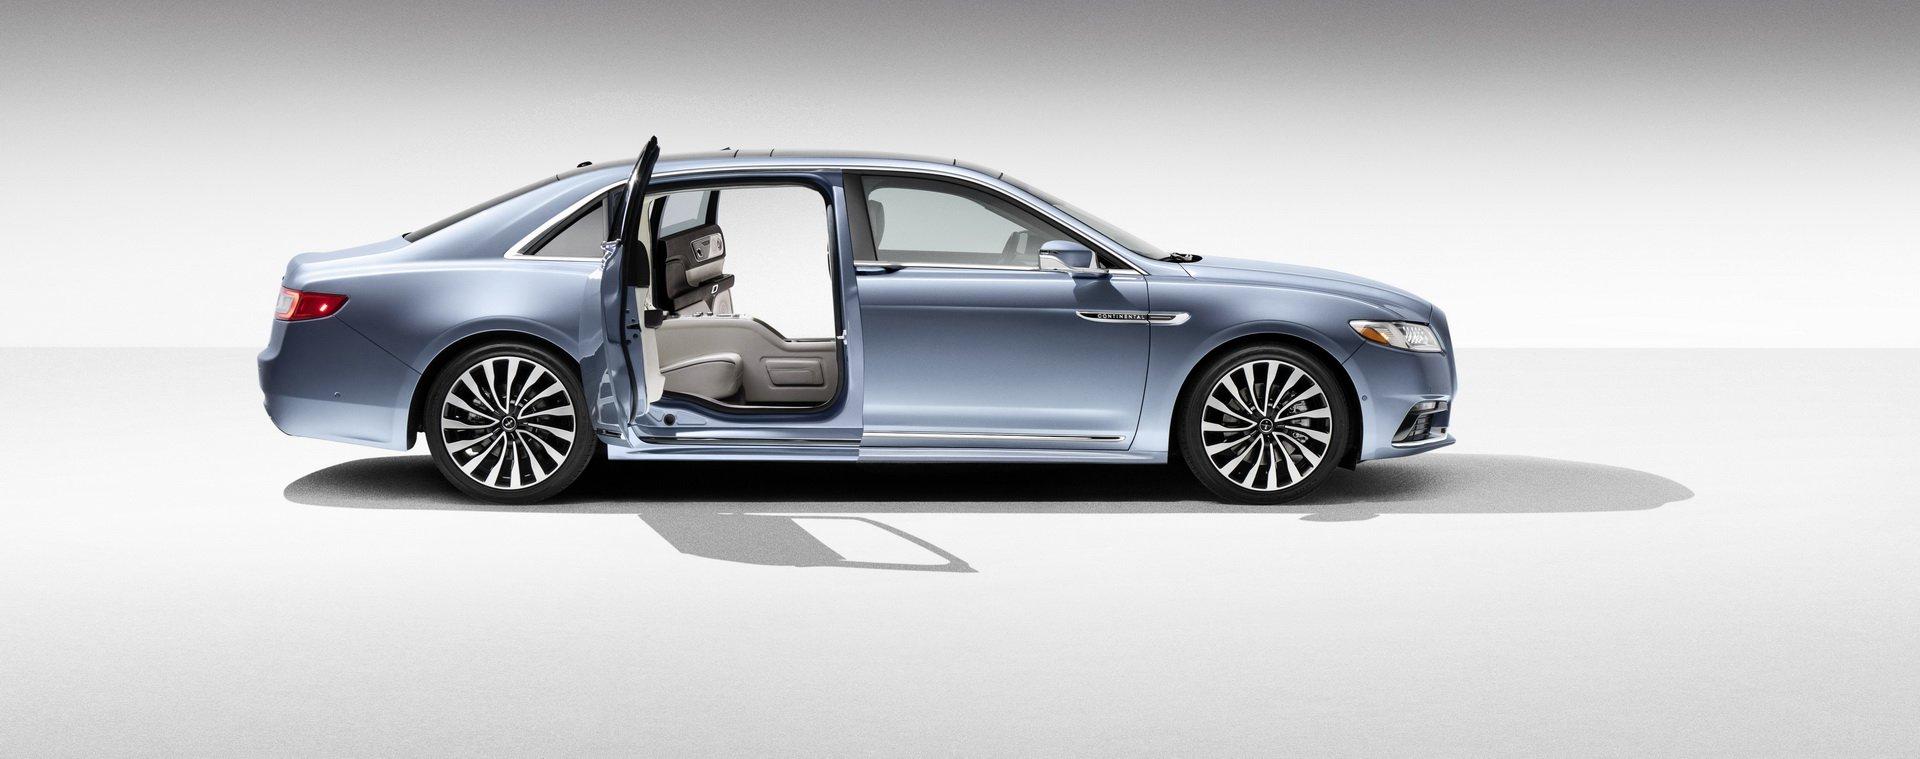 Lincoln Continental Coach Door Edition (45)